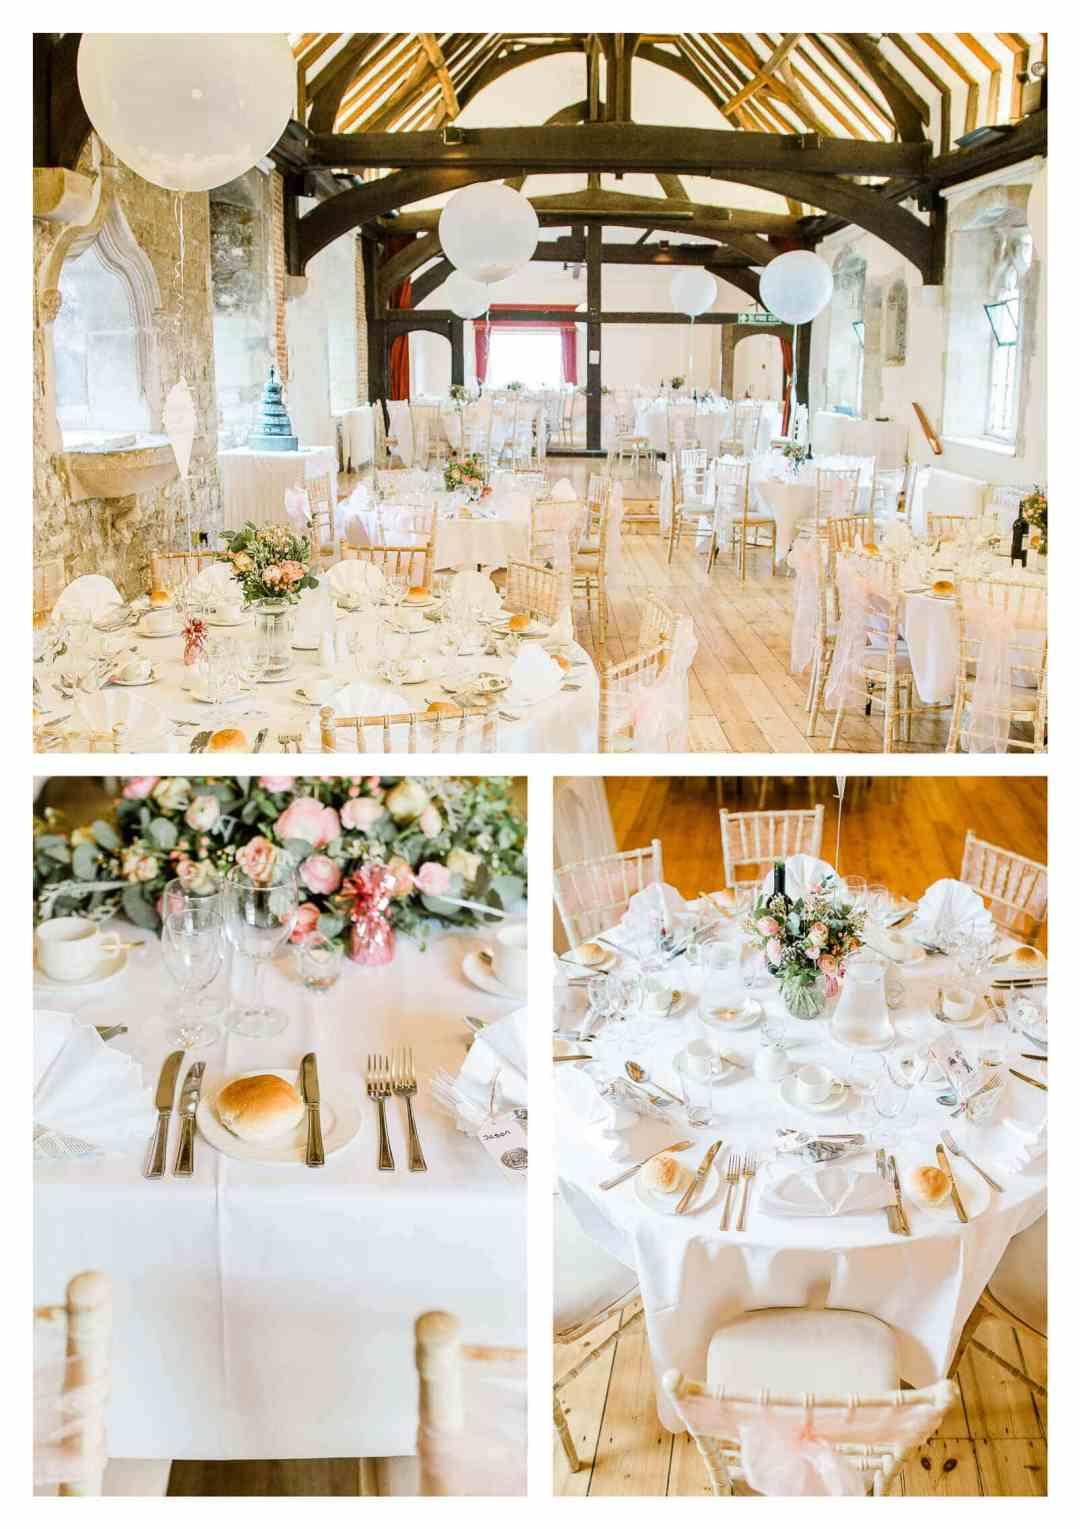 Chichester Cathedral venue wedding breakfast decor | West Sussex photographer